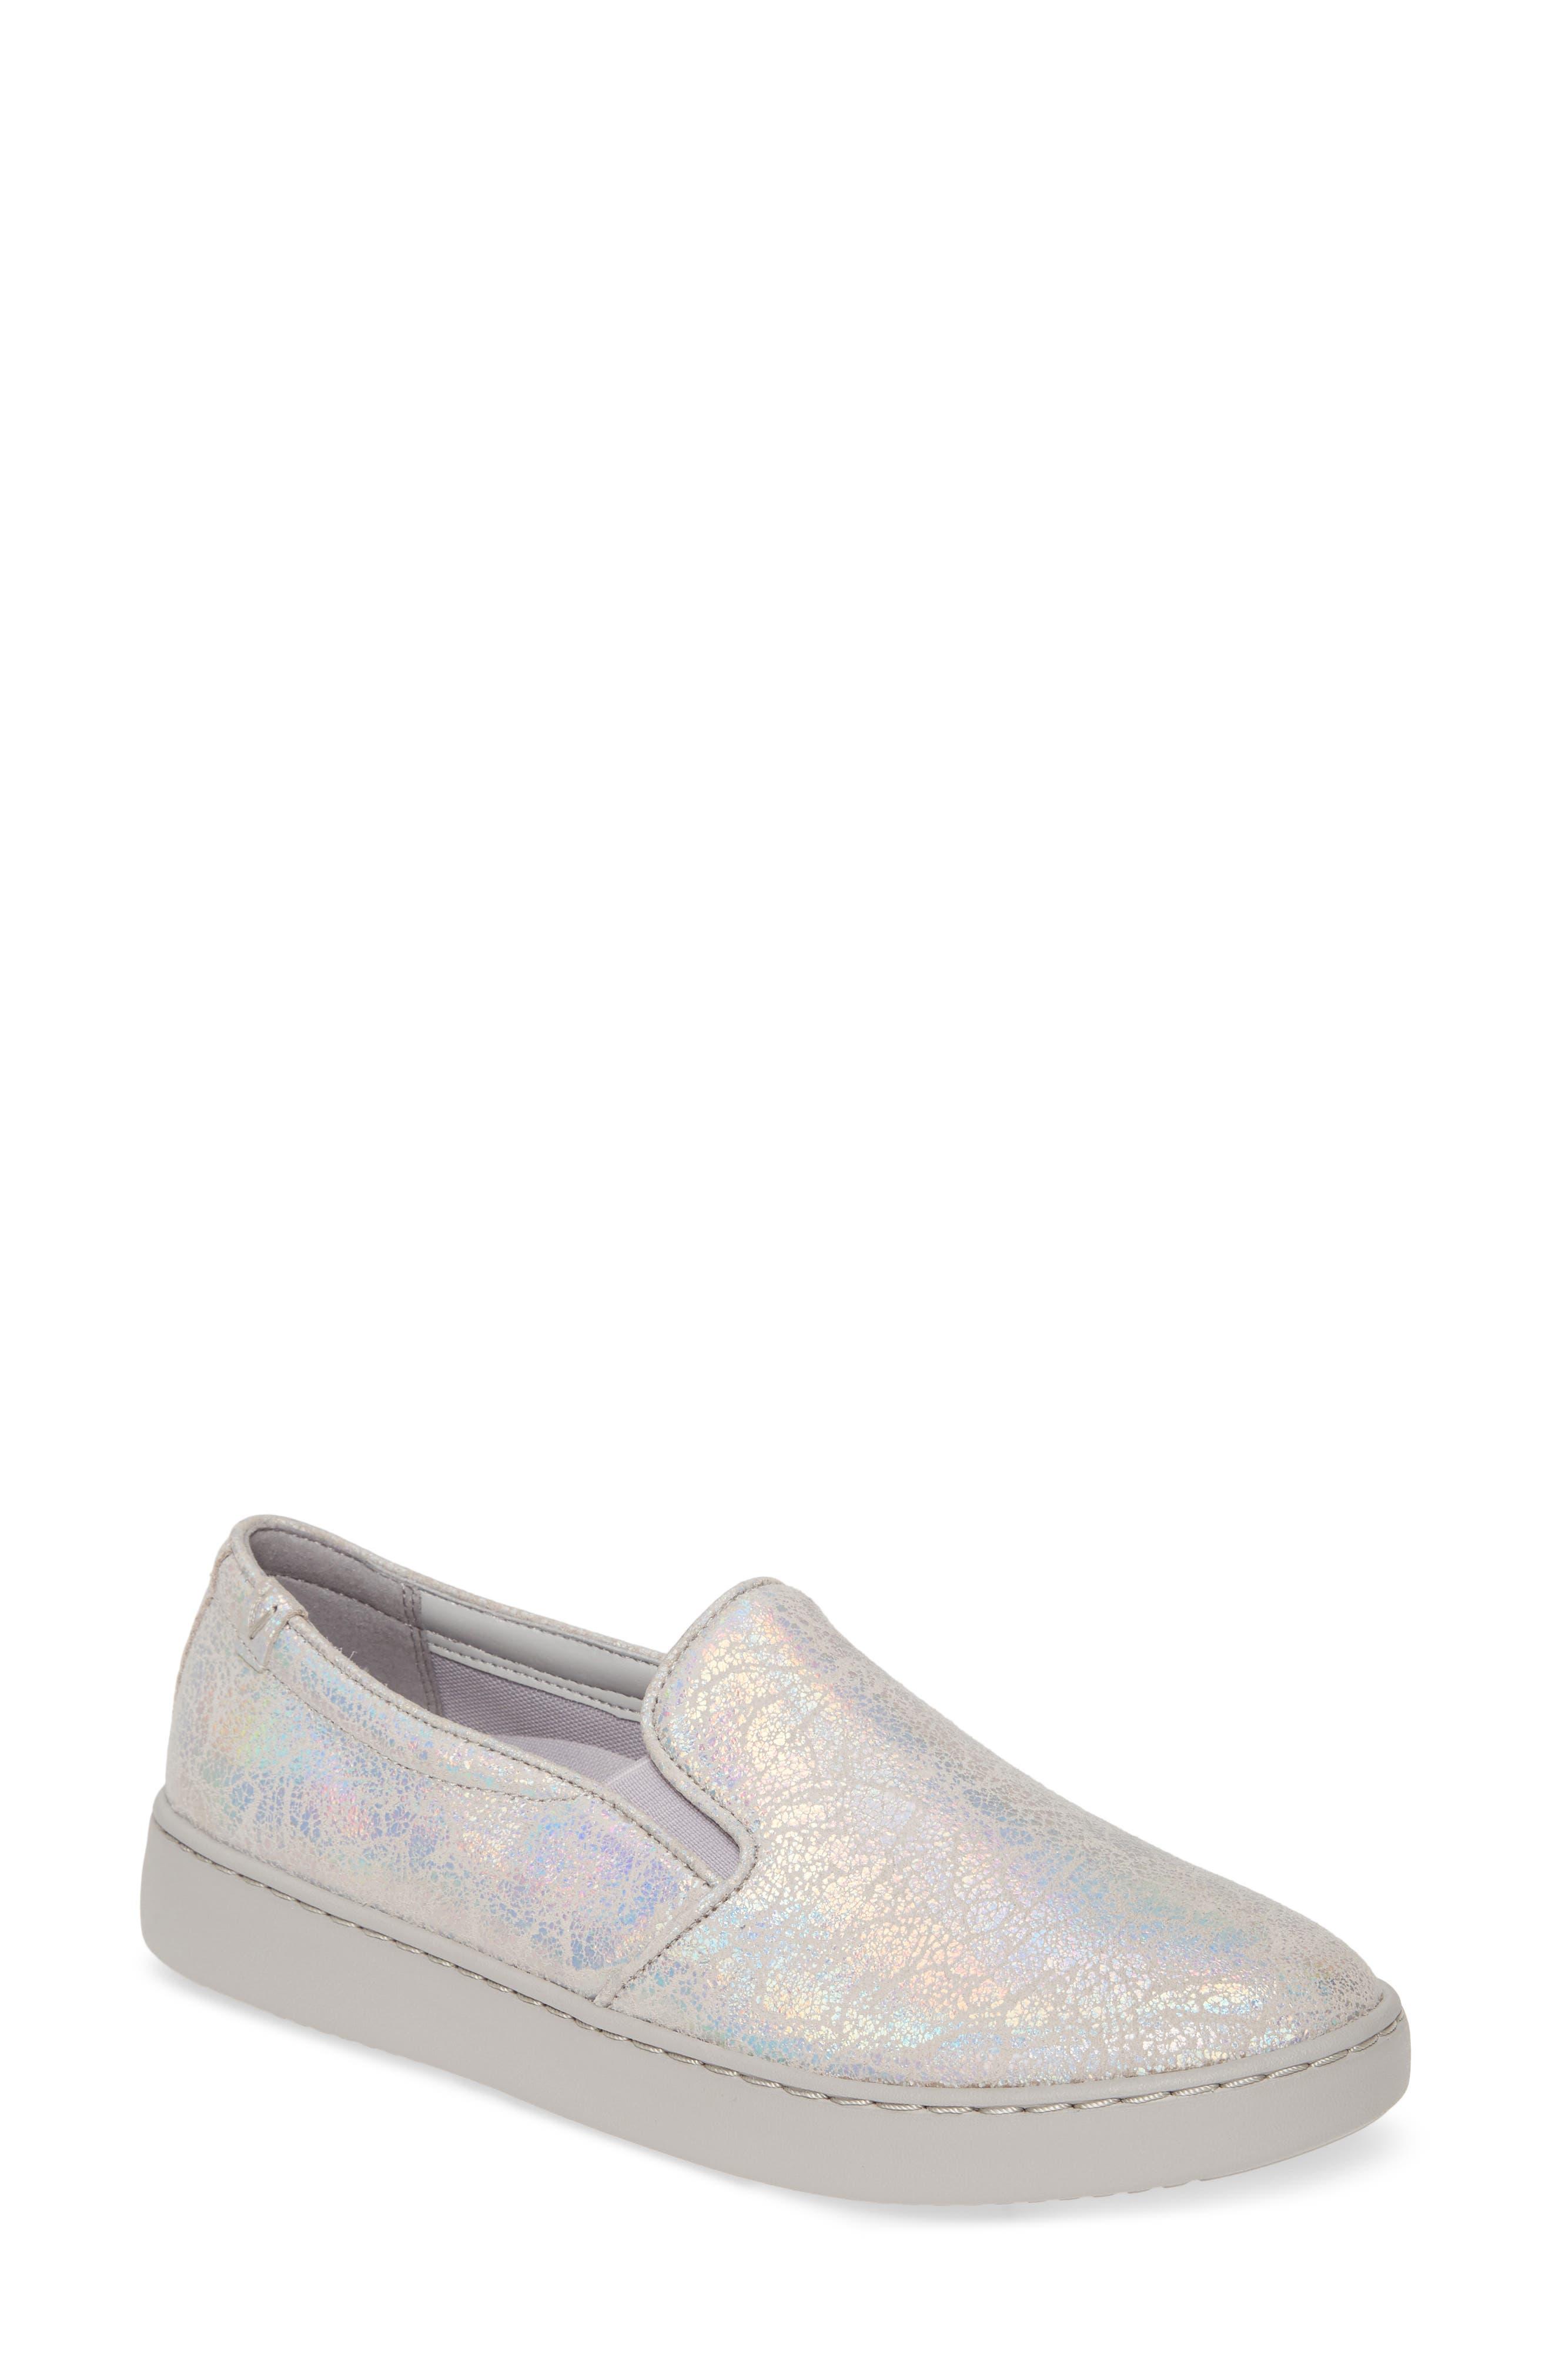 Vionic Avery Sneaker, Metallic